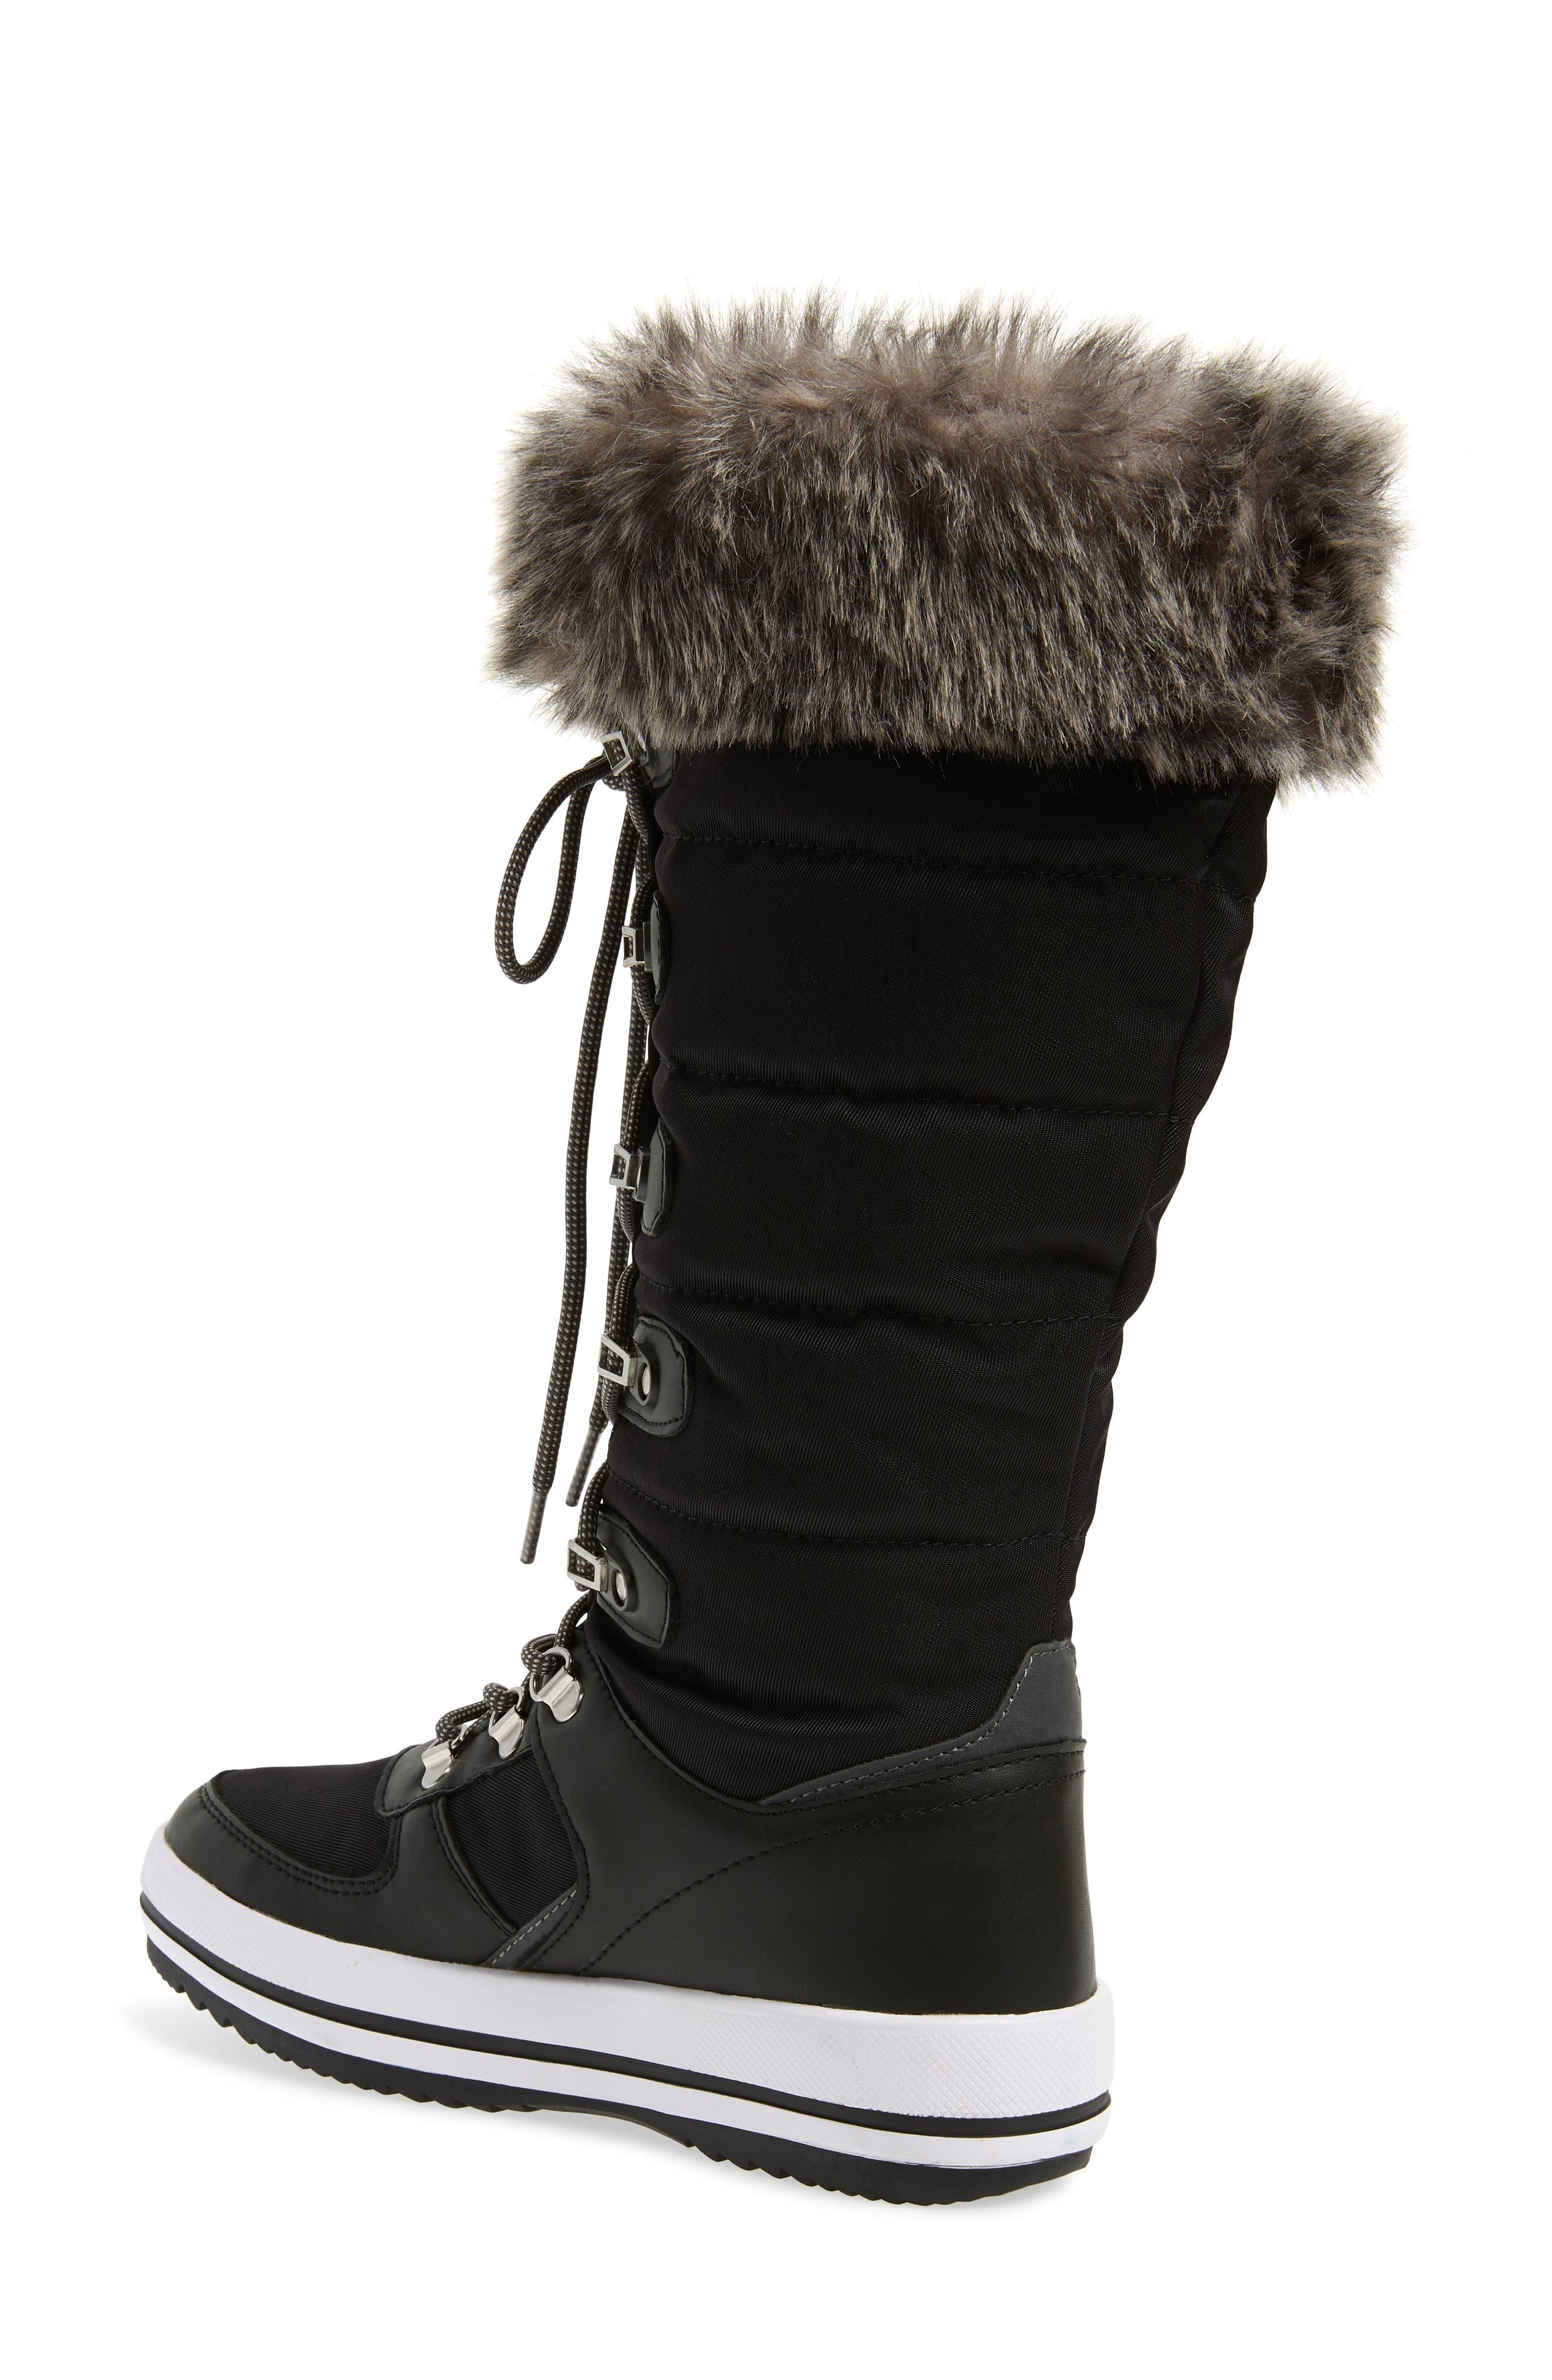 COUGAR, Vesta Faux Fur Collar Knee High Snow Boot, Alternate thumbnail 2, color, BLACK FABRIC